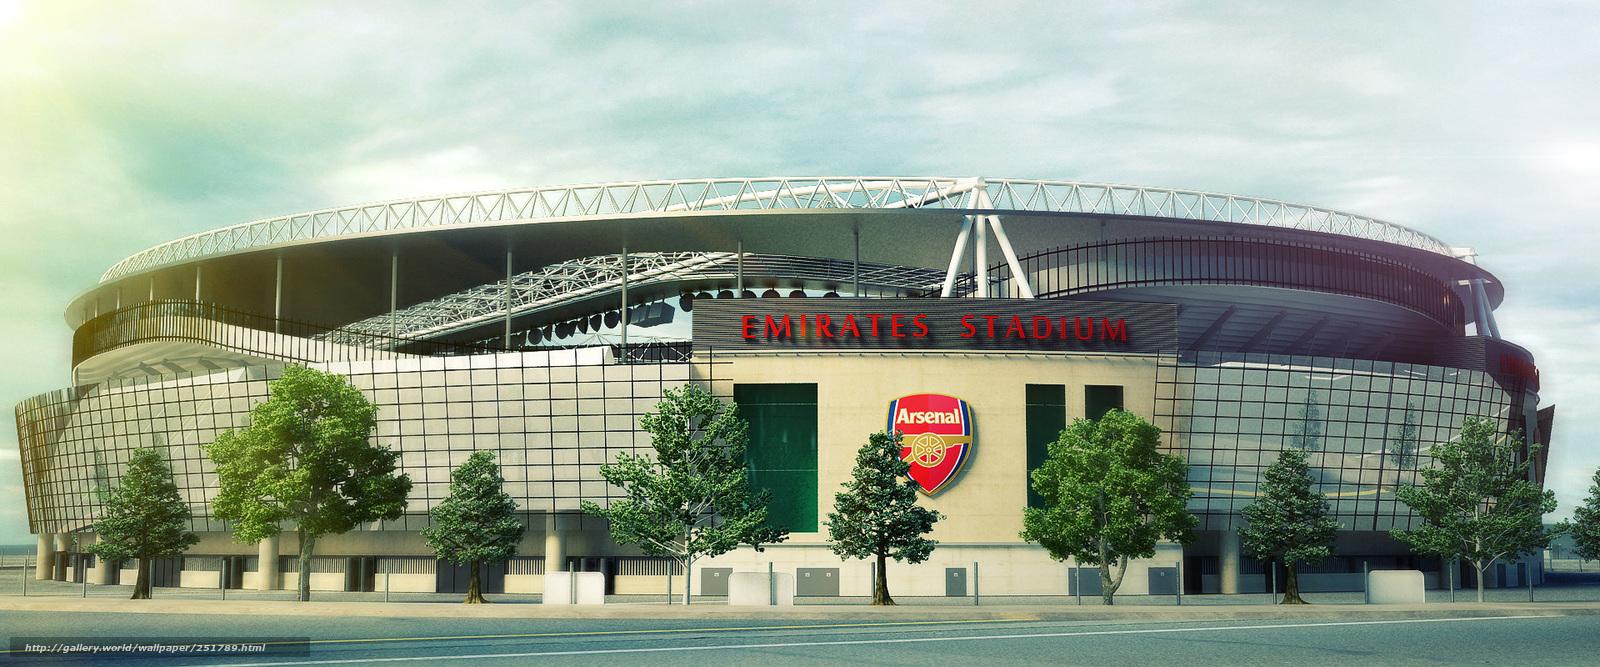 77 Emirates Stadium Wallpapers On Wallpapersafari